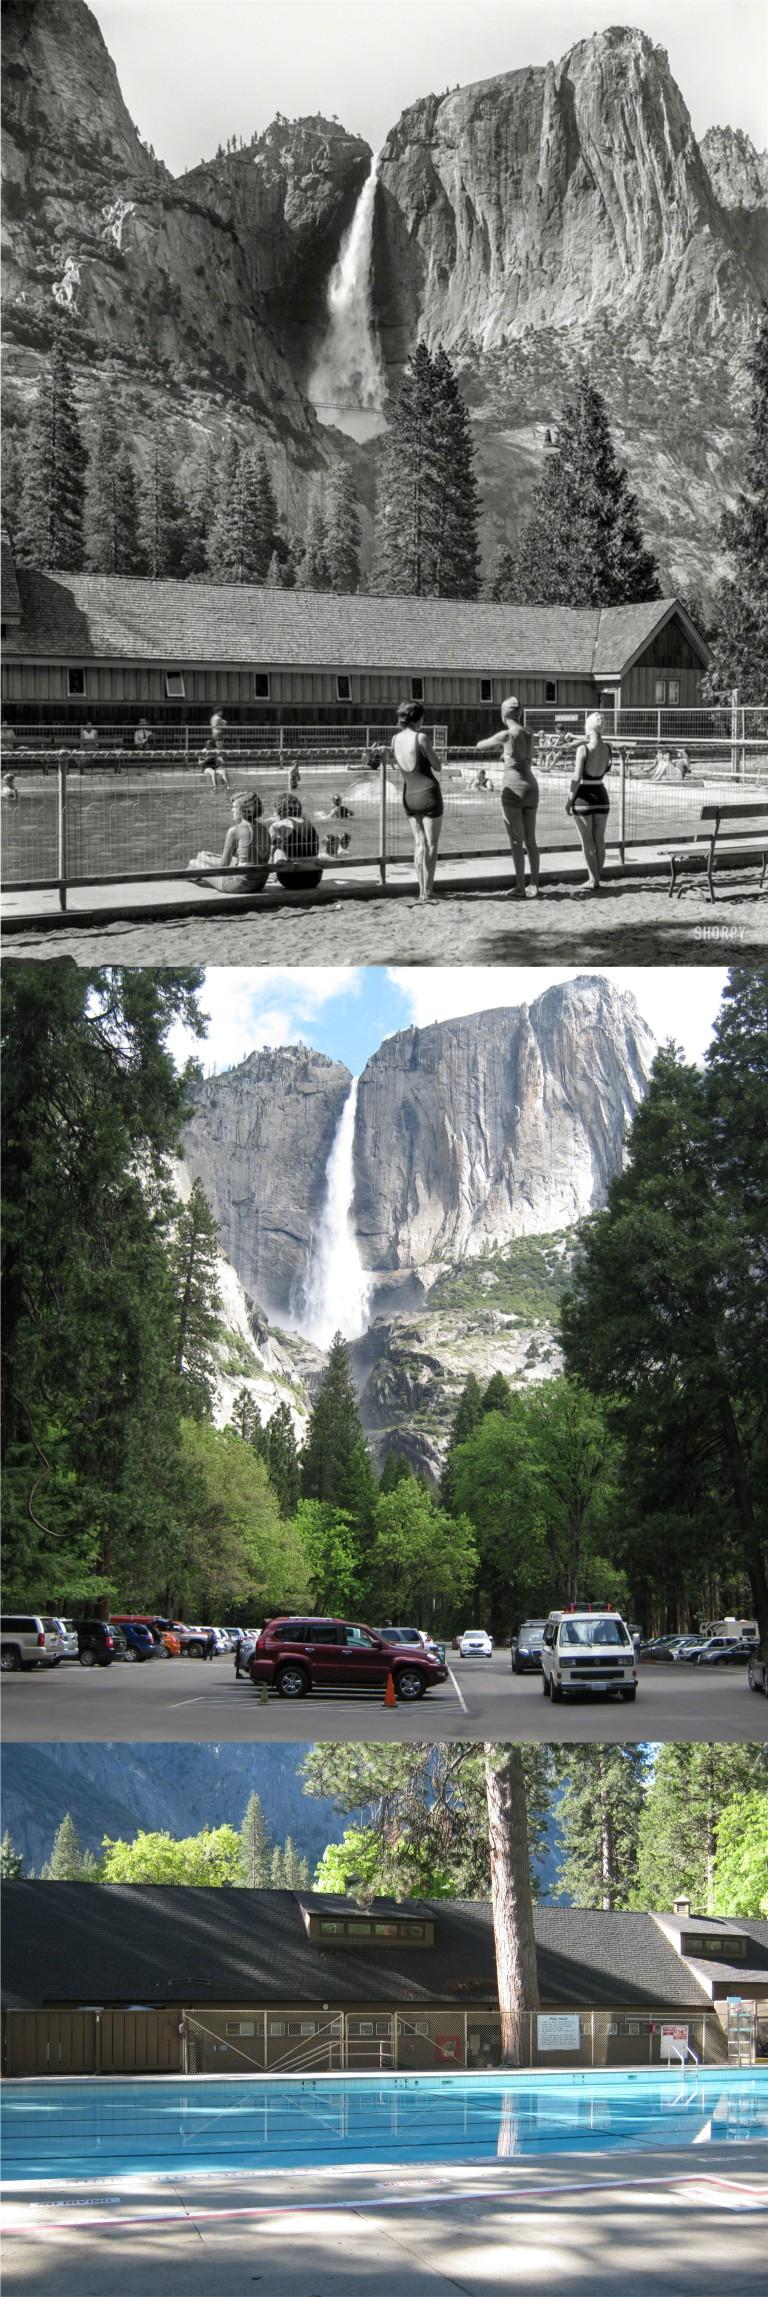 Yosemitepooluse